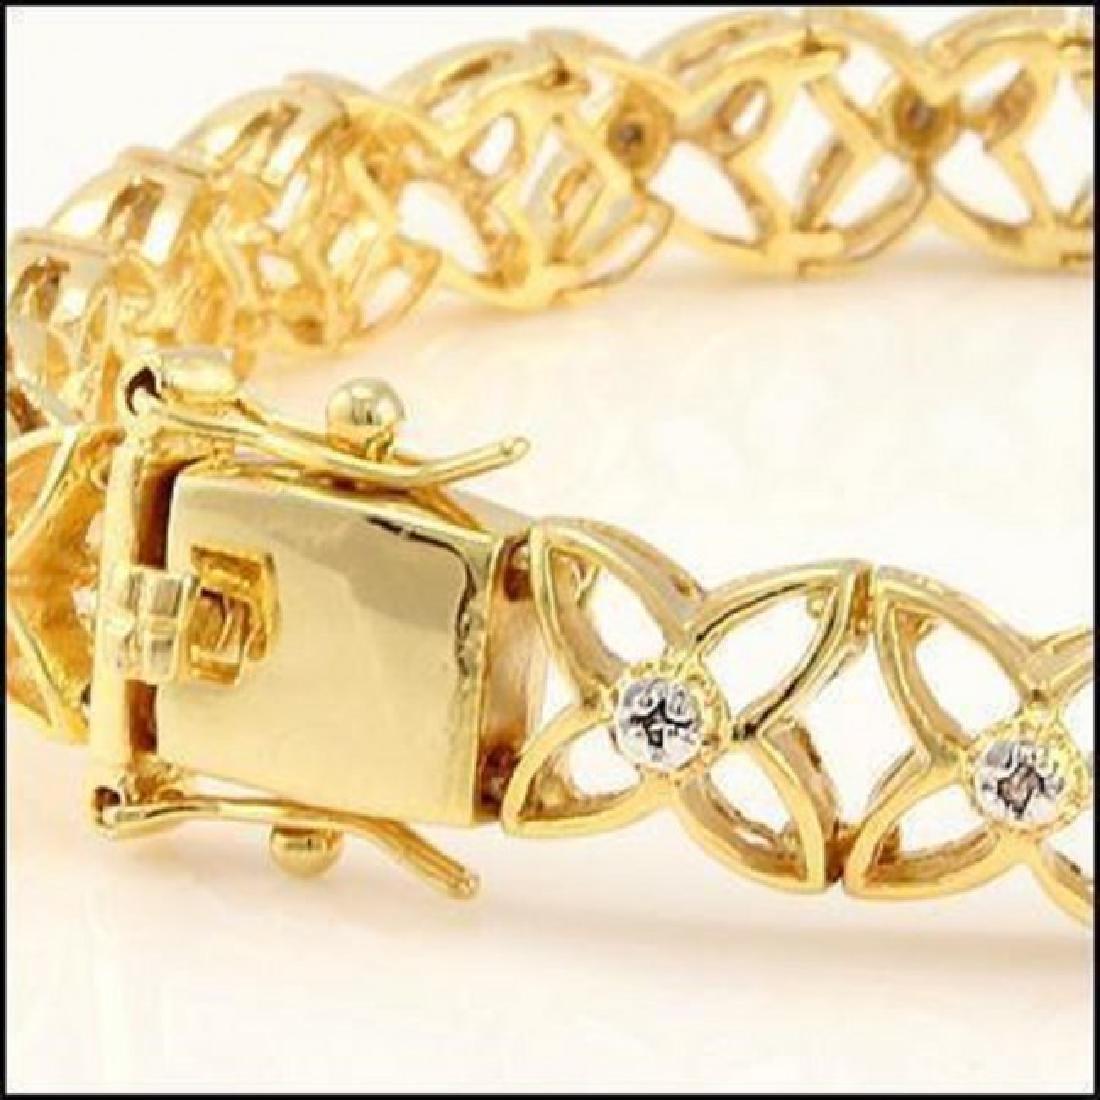 0.77 CT Diamond Fine Designer Bracelet $1570 - 2